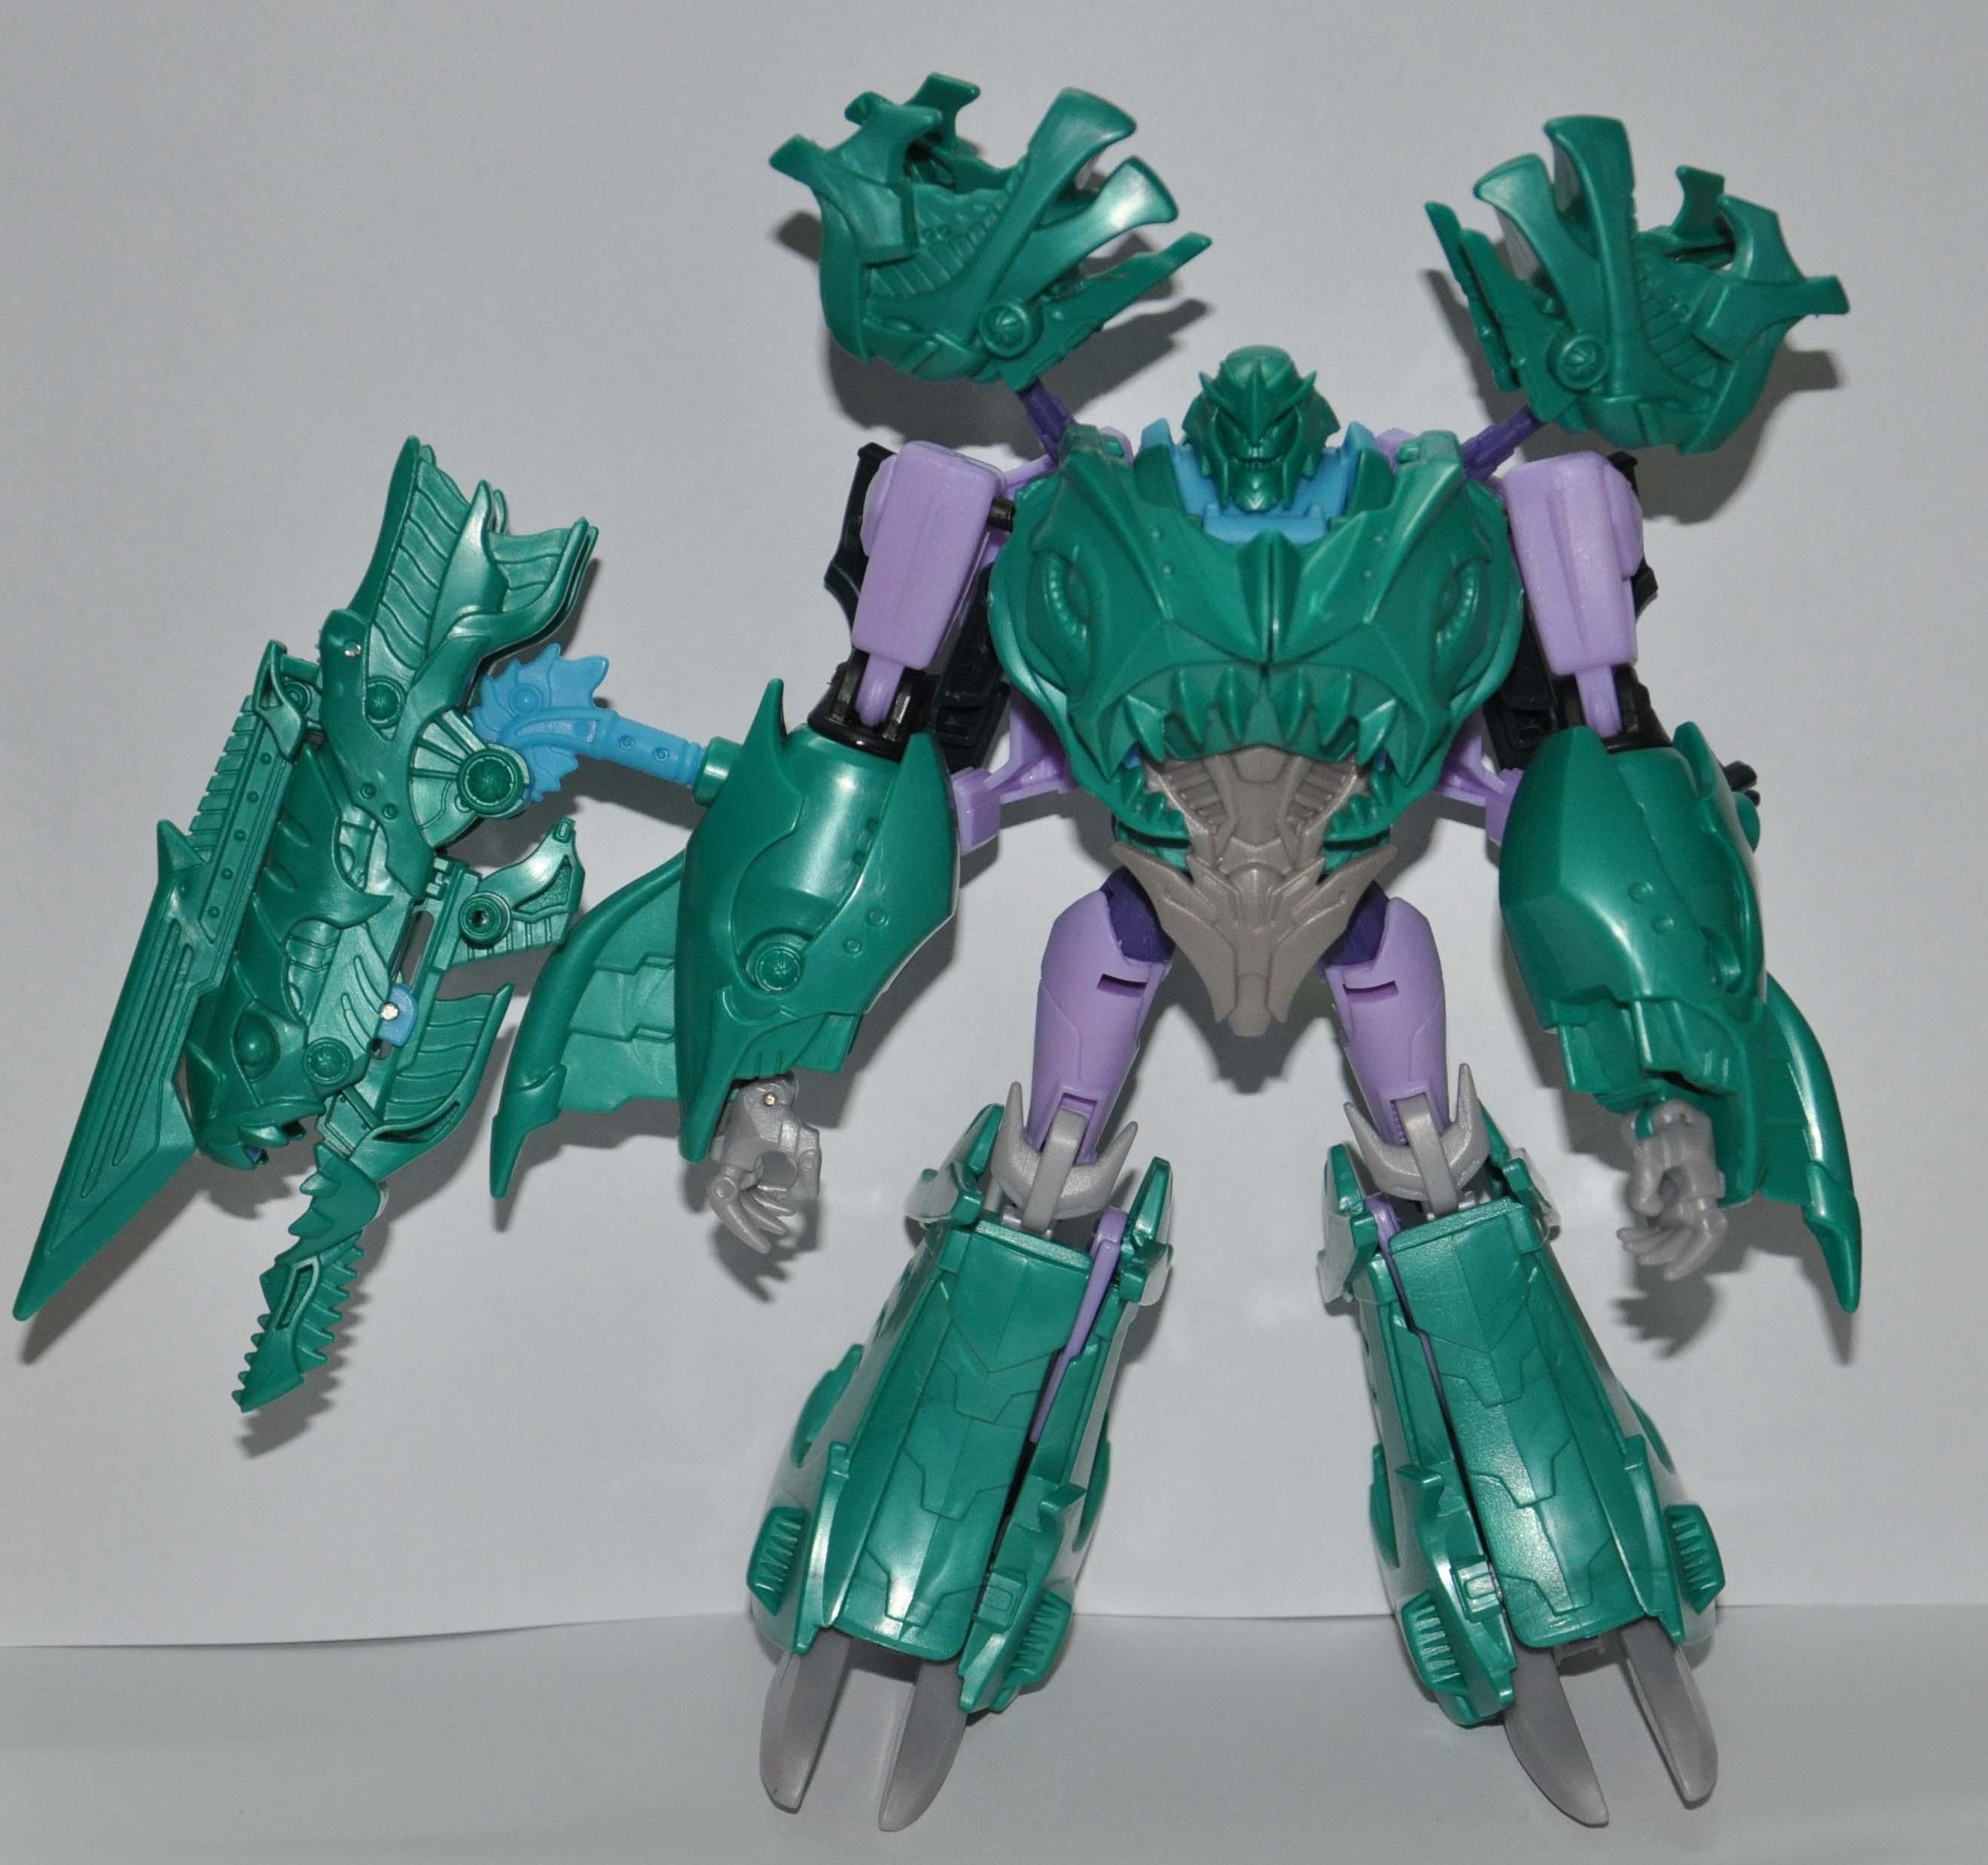 Transforners-beast-hunters-megatron-prototype-front